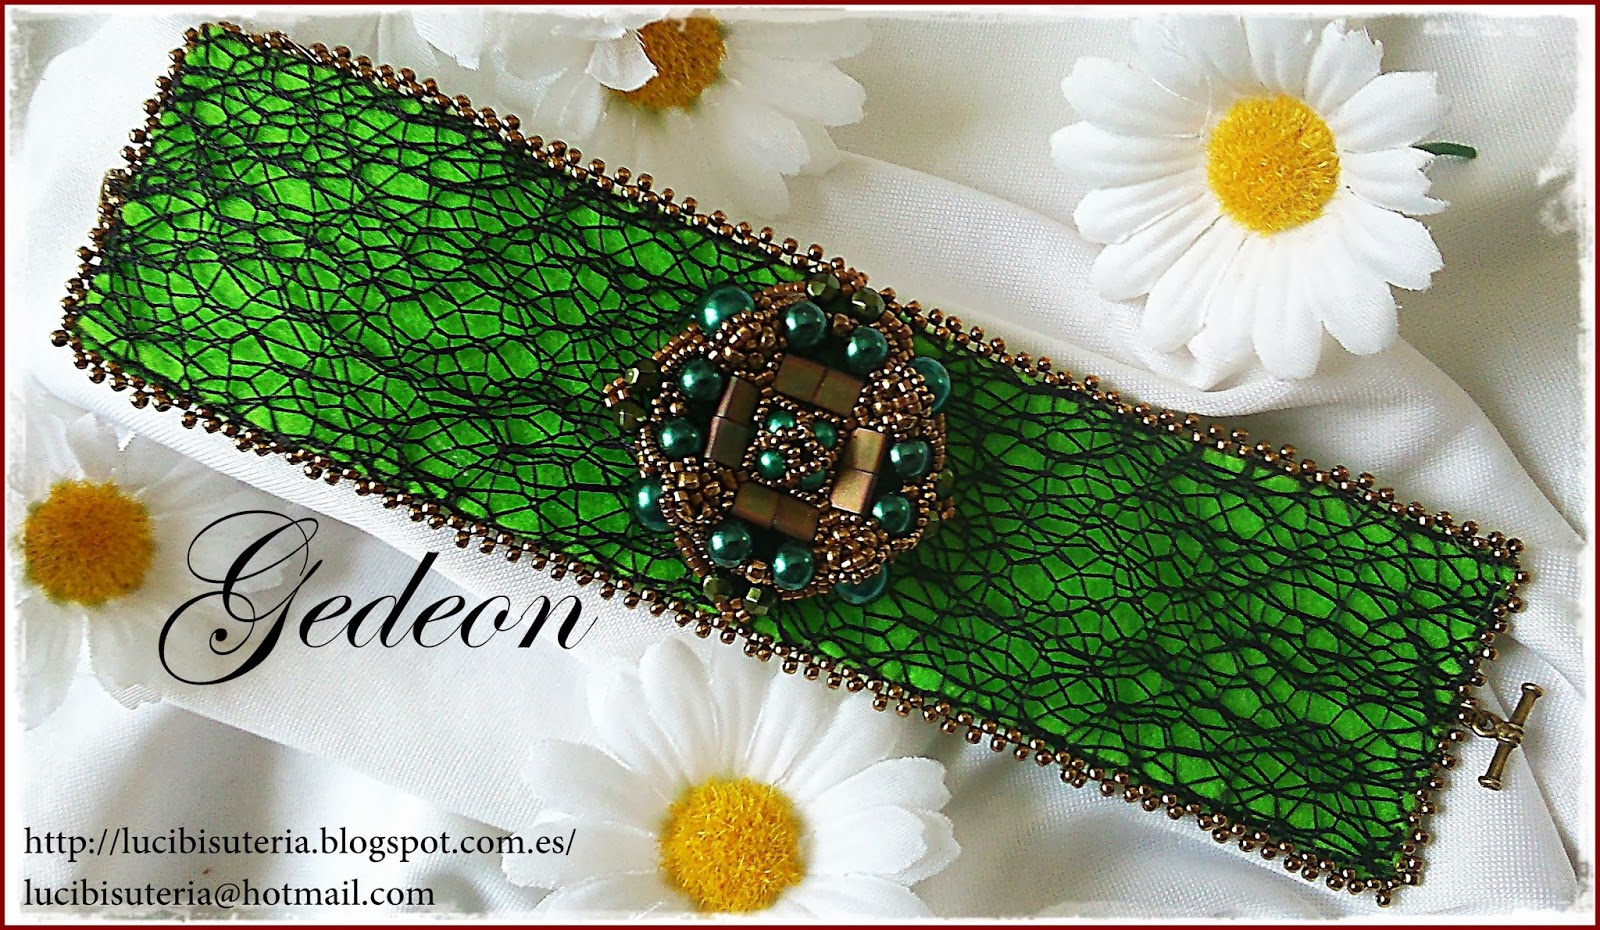 pulsera de artesania artesanal pulseras hechas a mano  - imagenes de pulseras hechas a mano